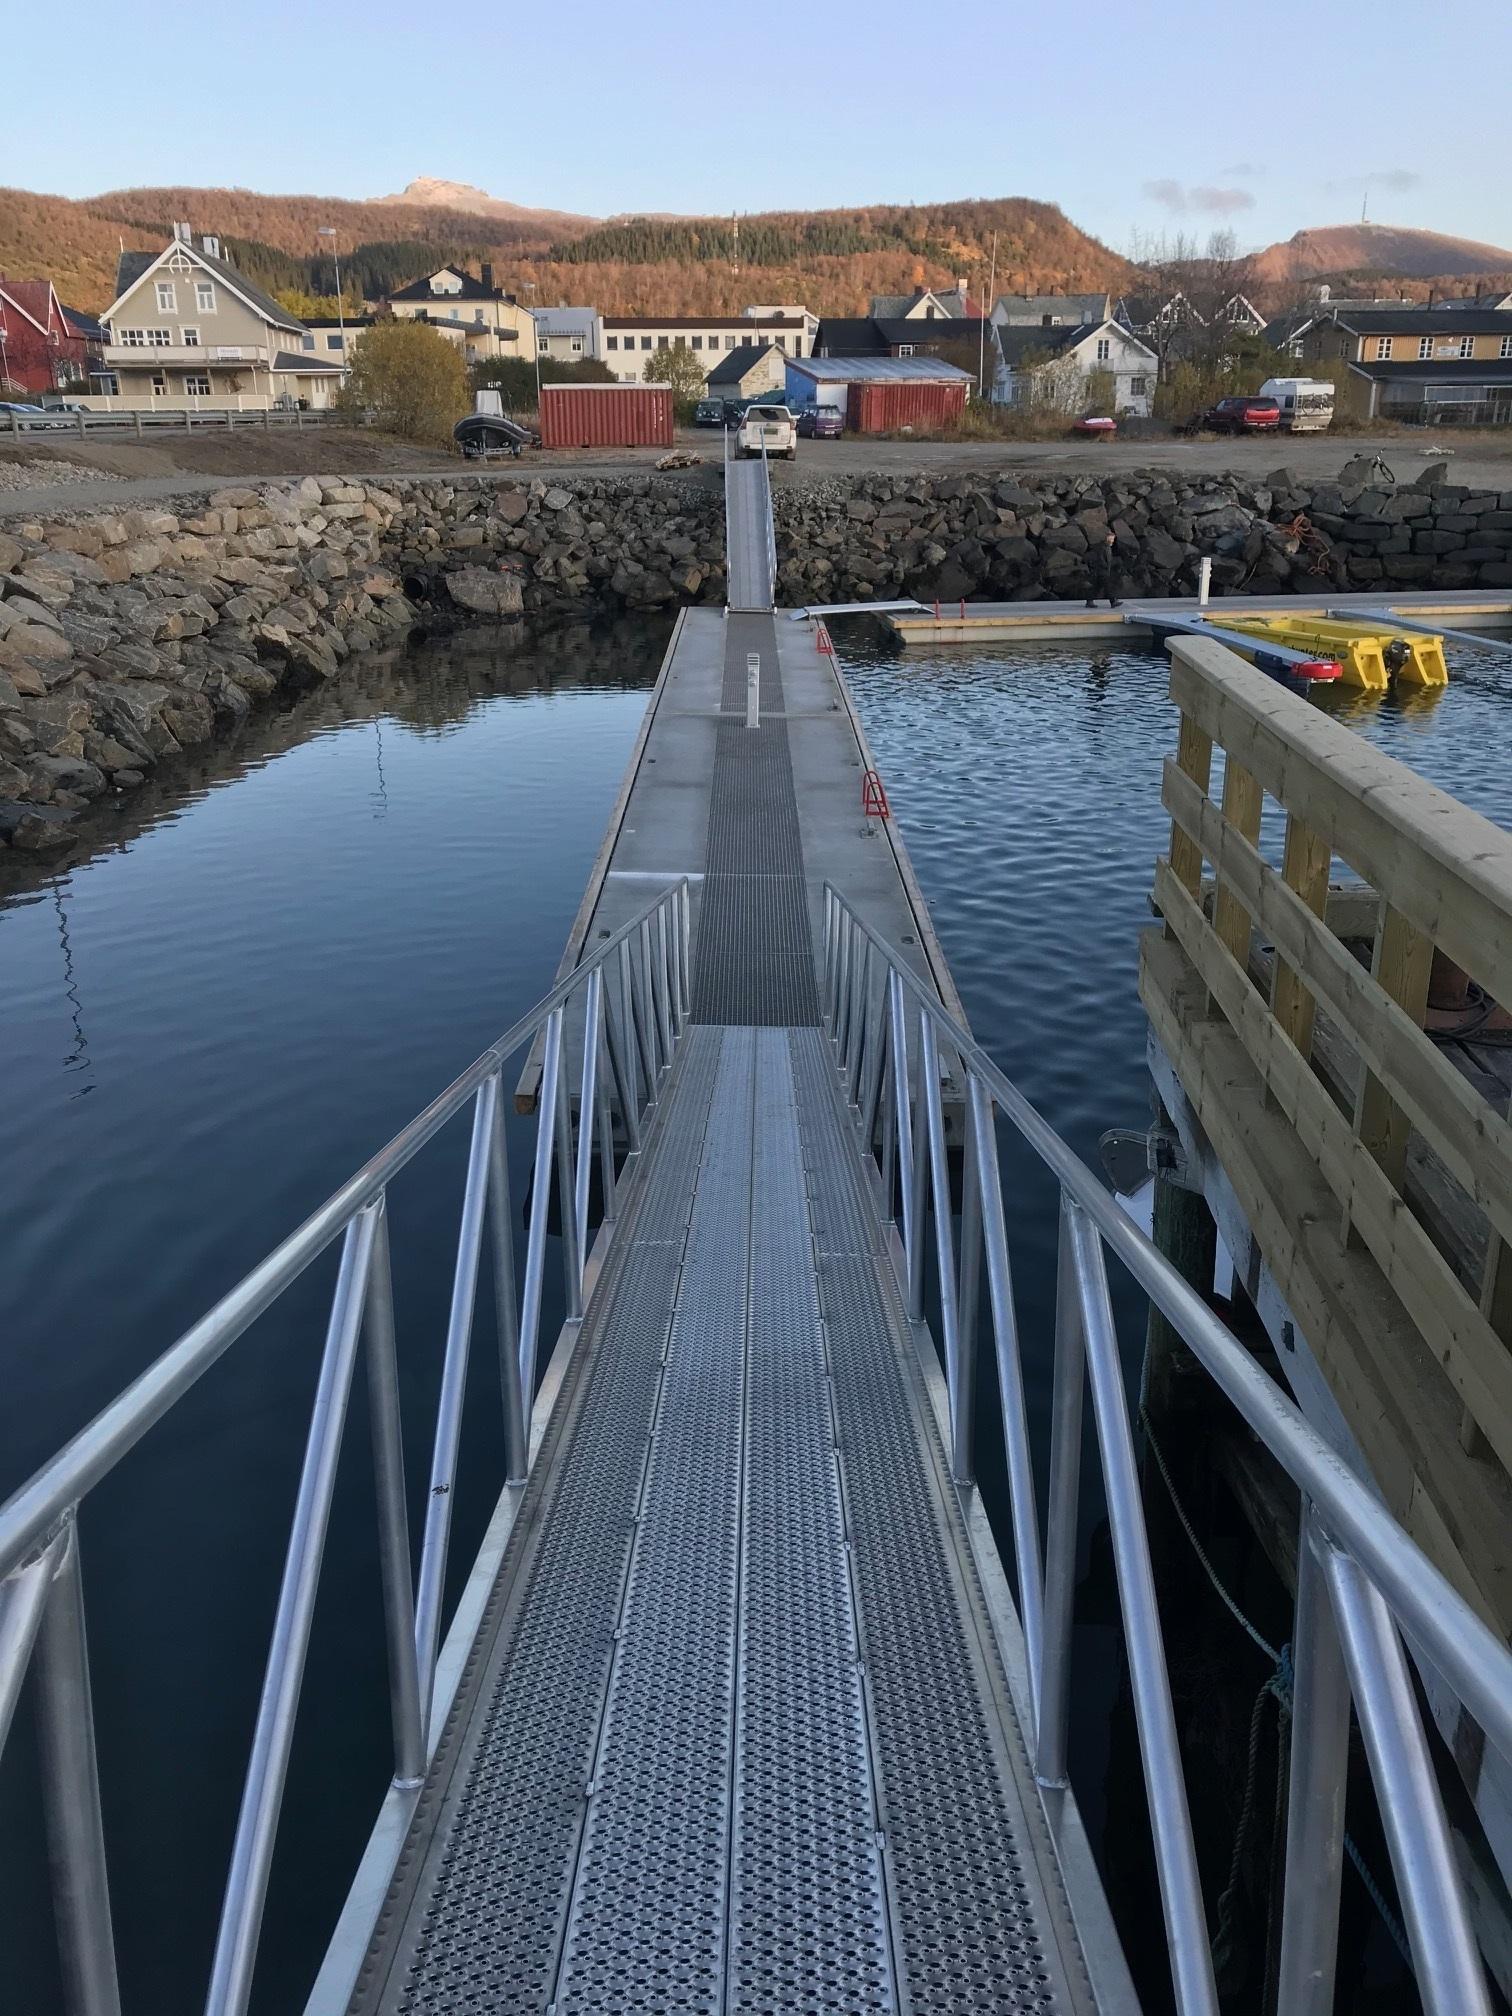 https://www.marinasolutions.no/uploads/Hadsel-havn-melbu-snøfrie-betongbrygger-marina-solutions-Tallykey-strømposter-3.jpg